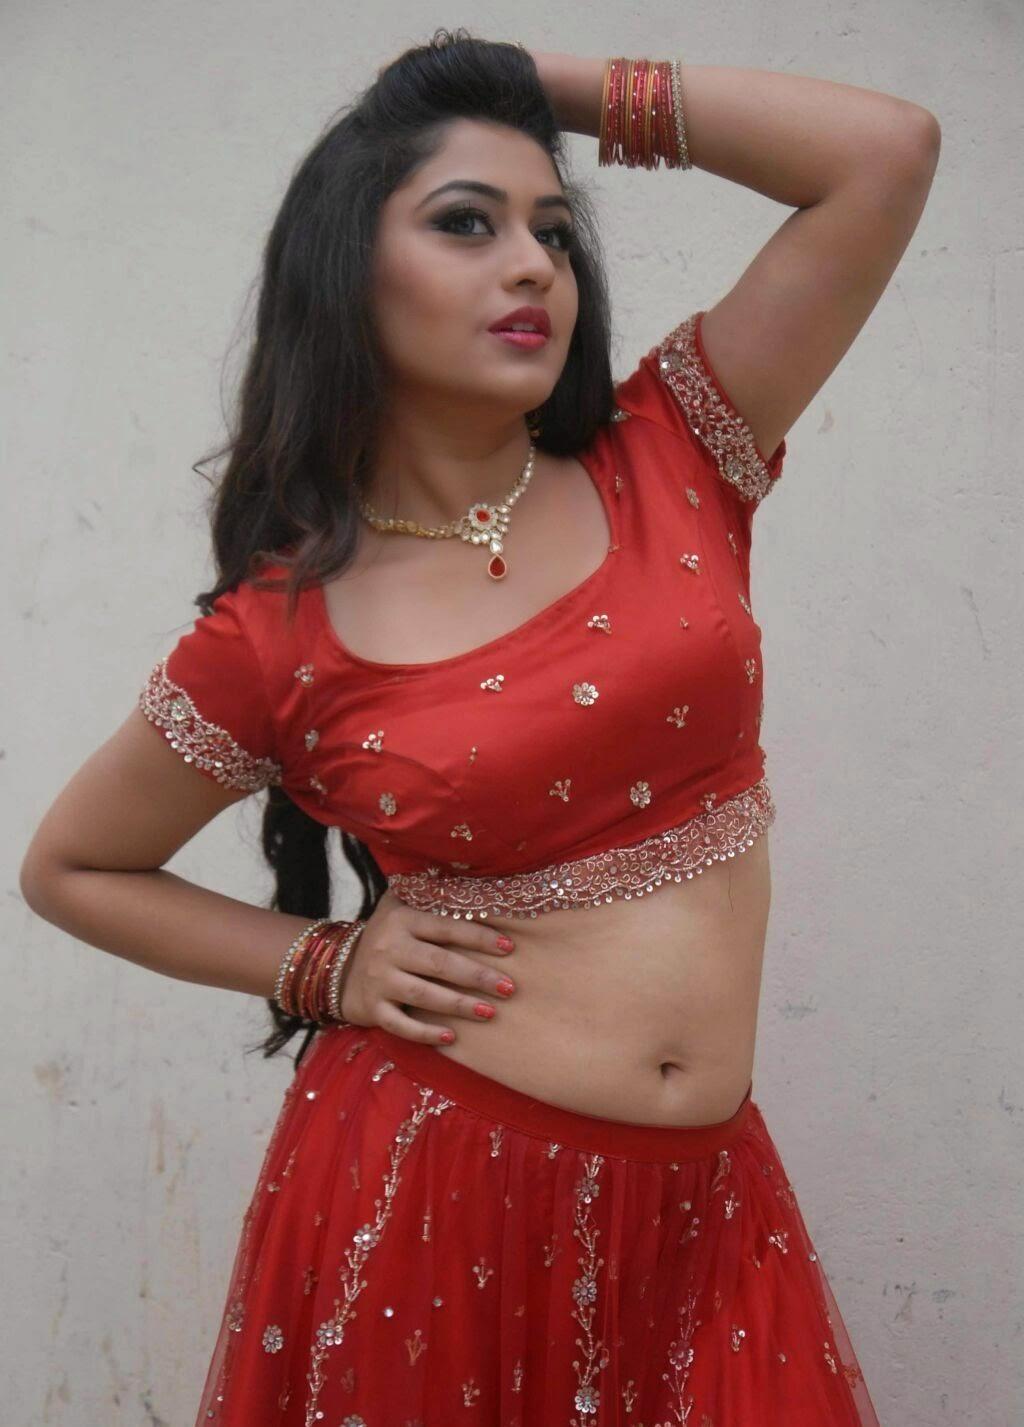 Kannada Actress Ramya Hot Navel In Saree Images & Pictures - Becuo